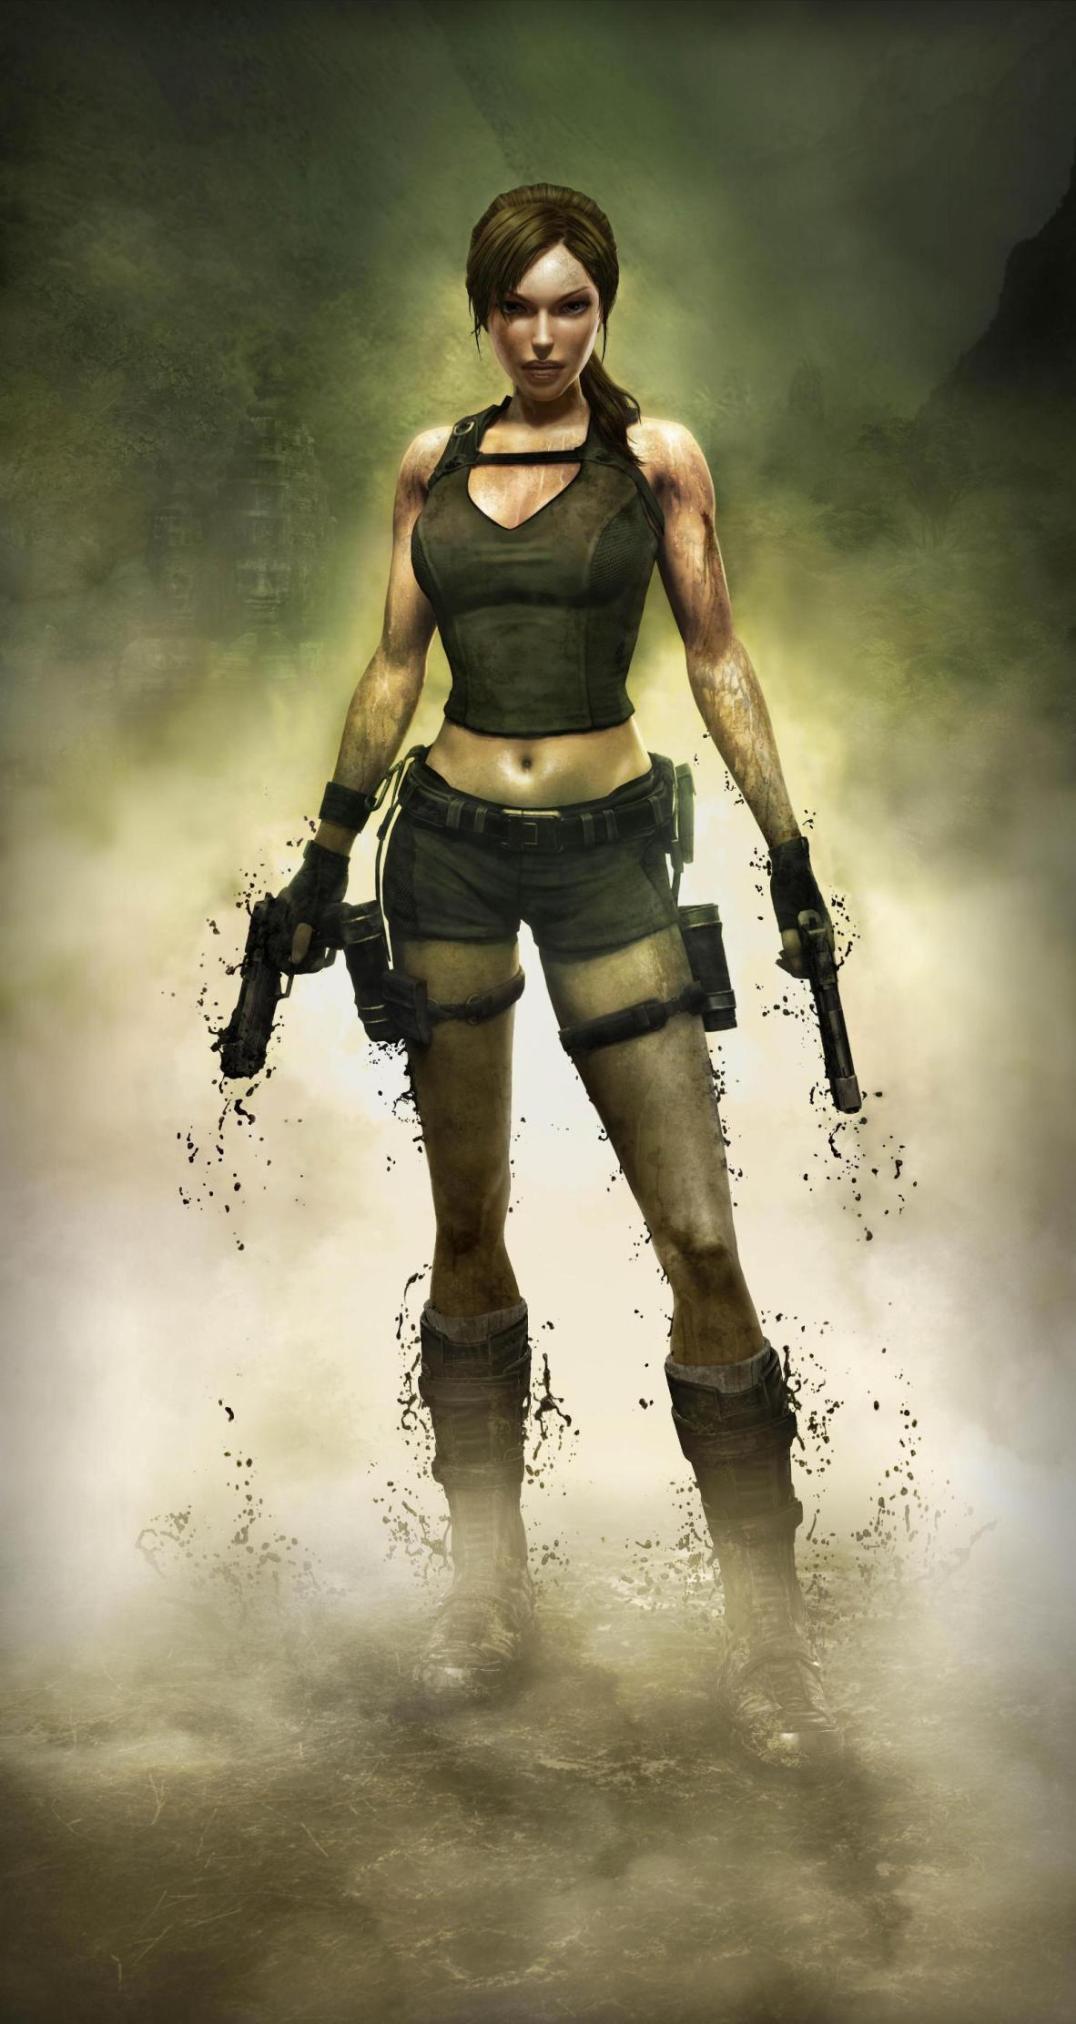 Tomb Raider | Euro Palace Casino Blog - Part 2